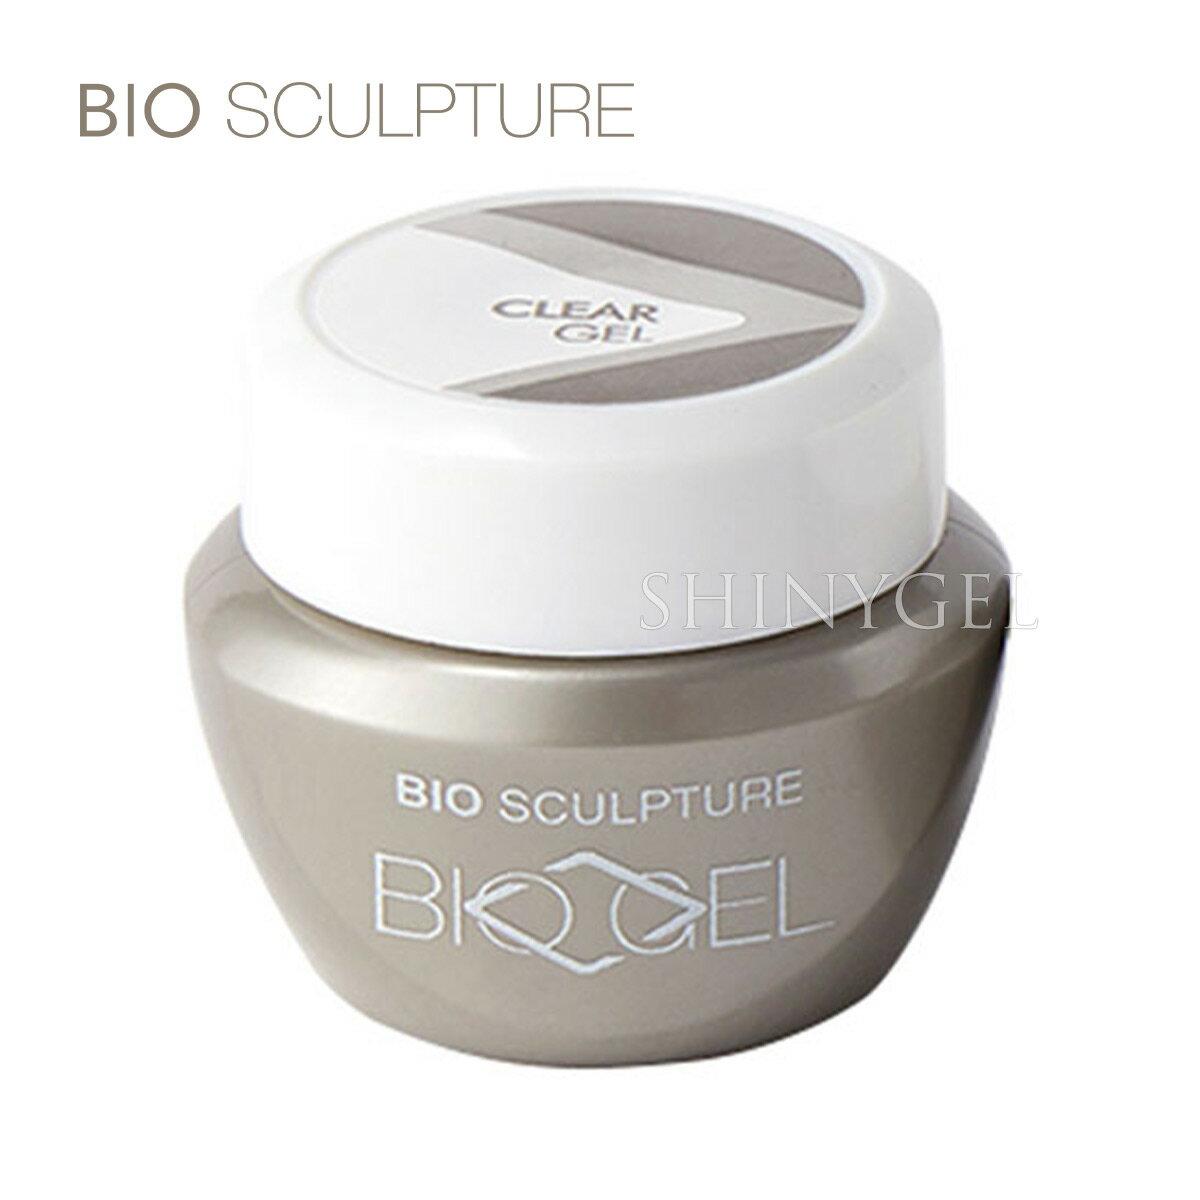 (48%OFF)Bio(바이오스카르프츄아제르):클리어 젤/10 g fs3gm